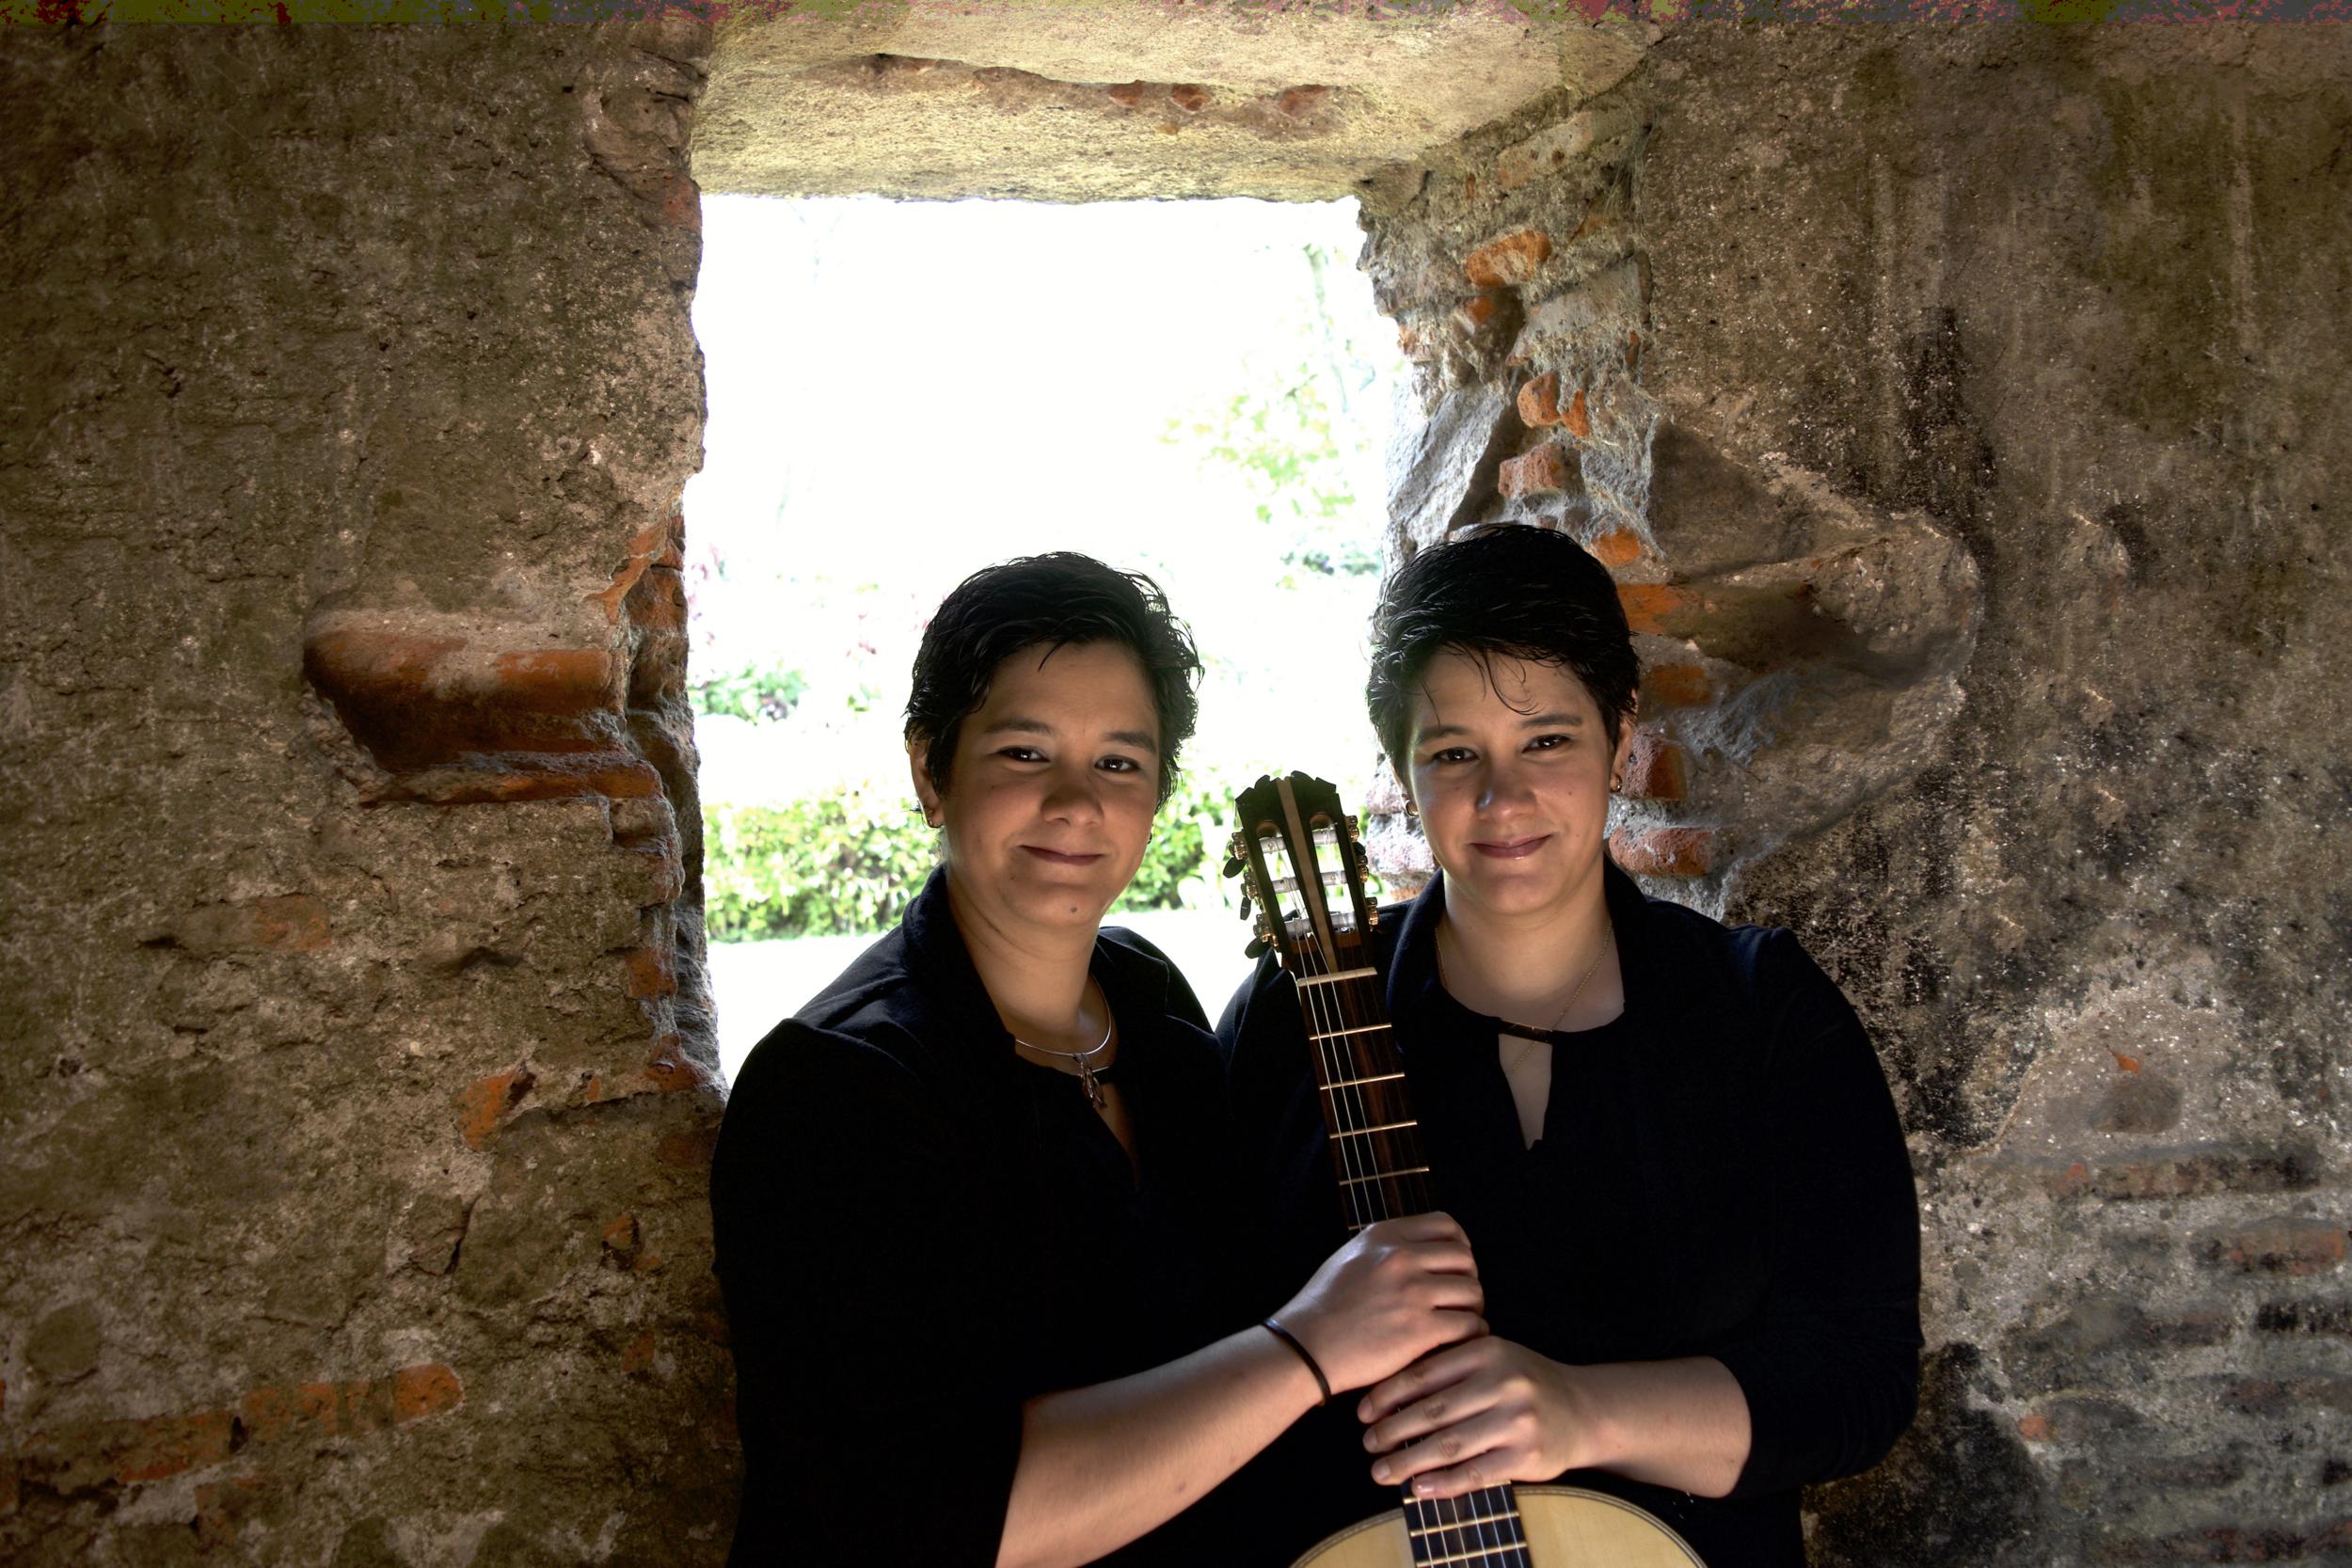 Paola & Evelyn Molina